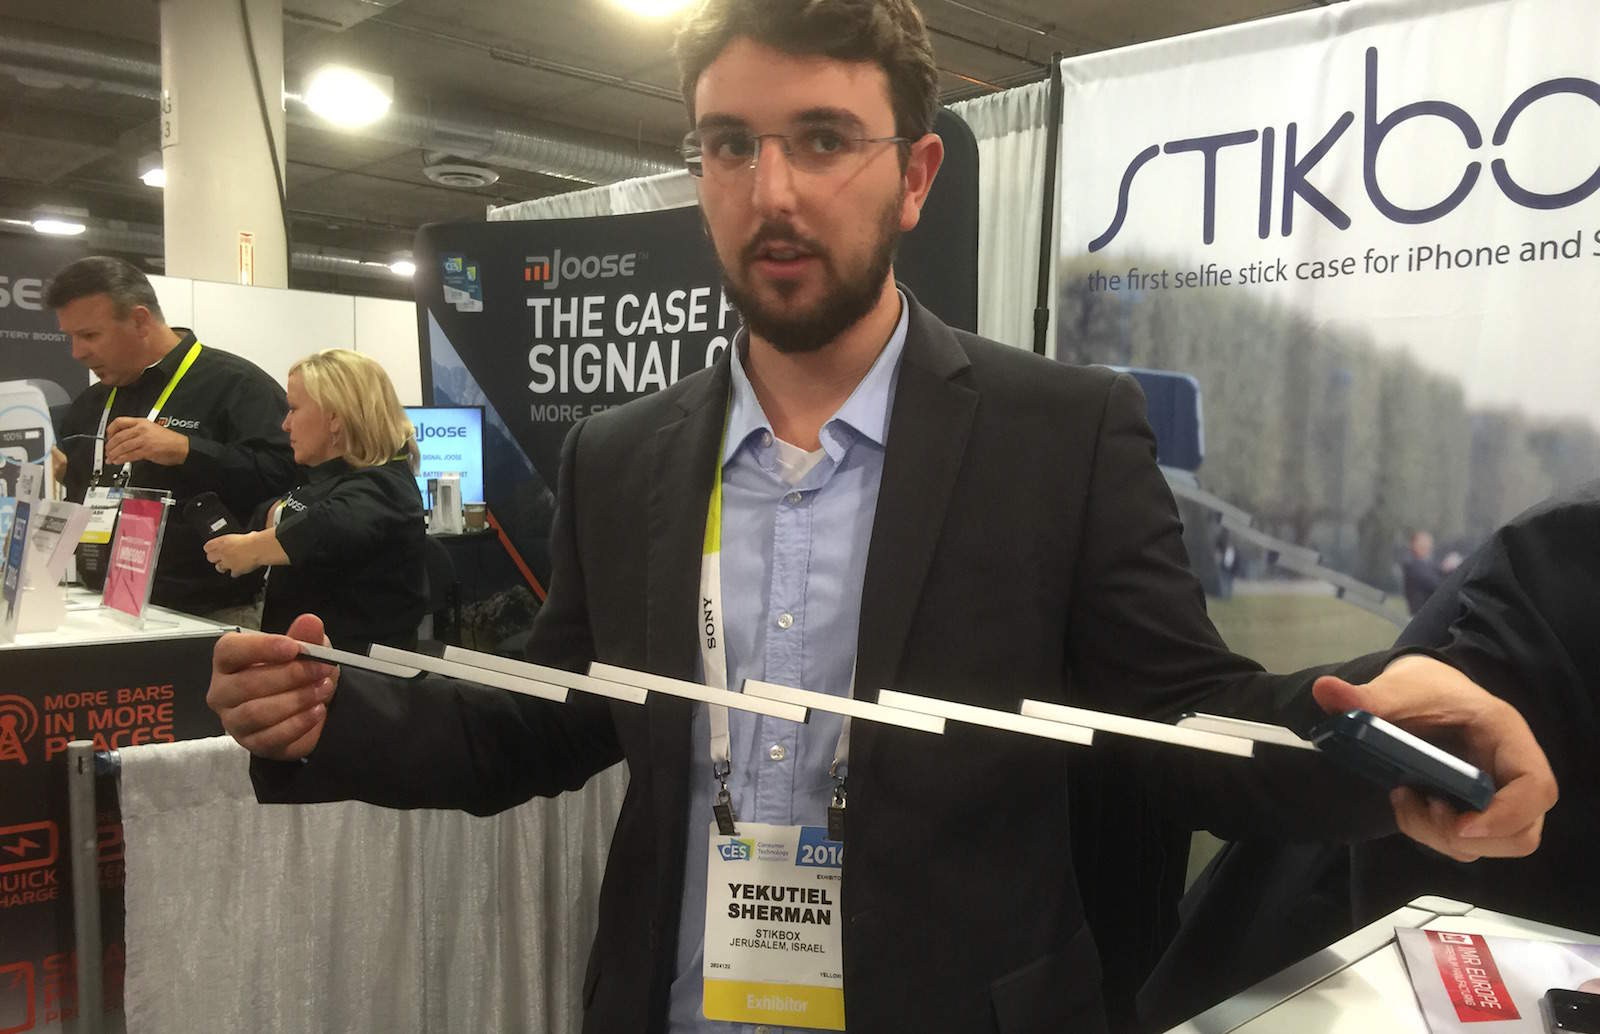 Stikbox selfie stick case CES 2016